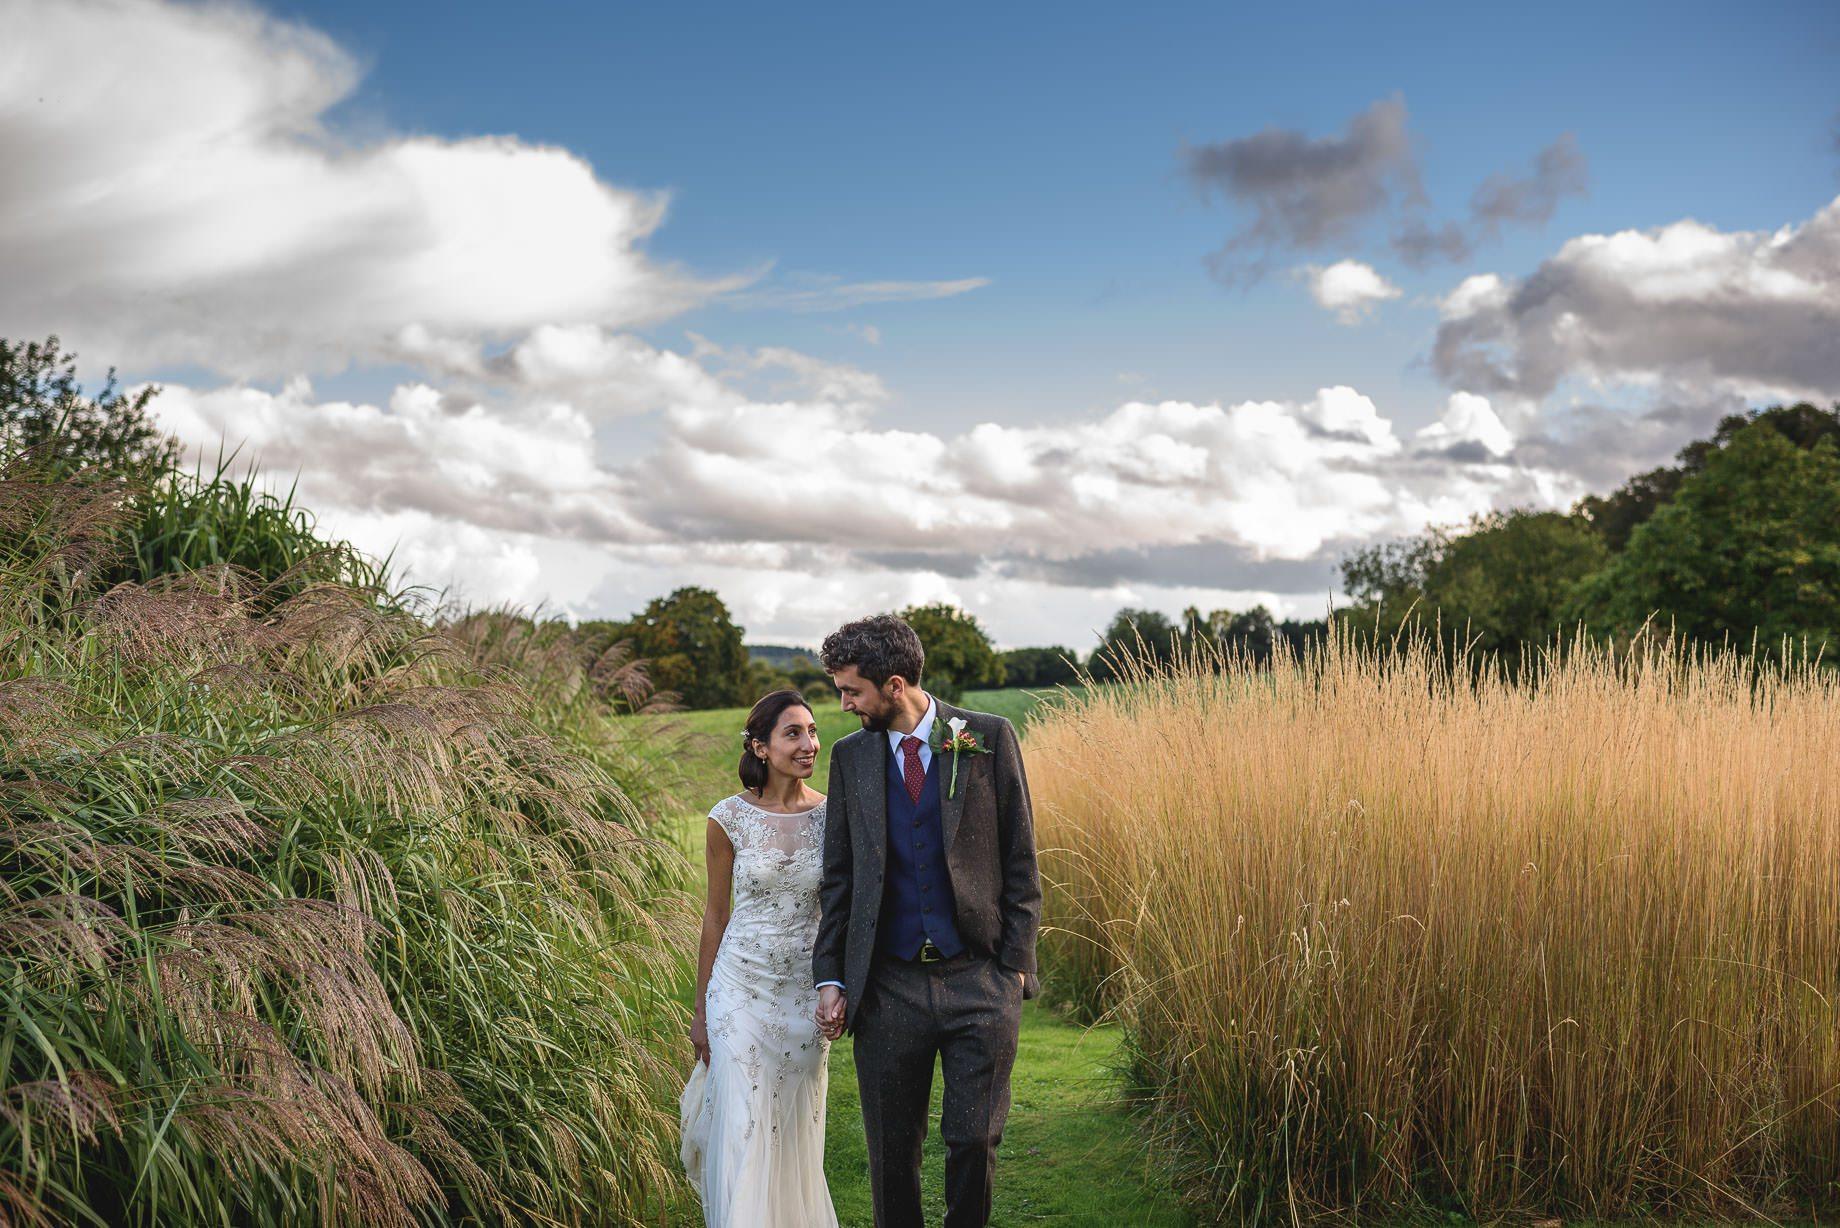 bury-court-barn-wedding-photography-guy-collier-photography-nadia-tom-111-of-184